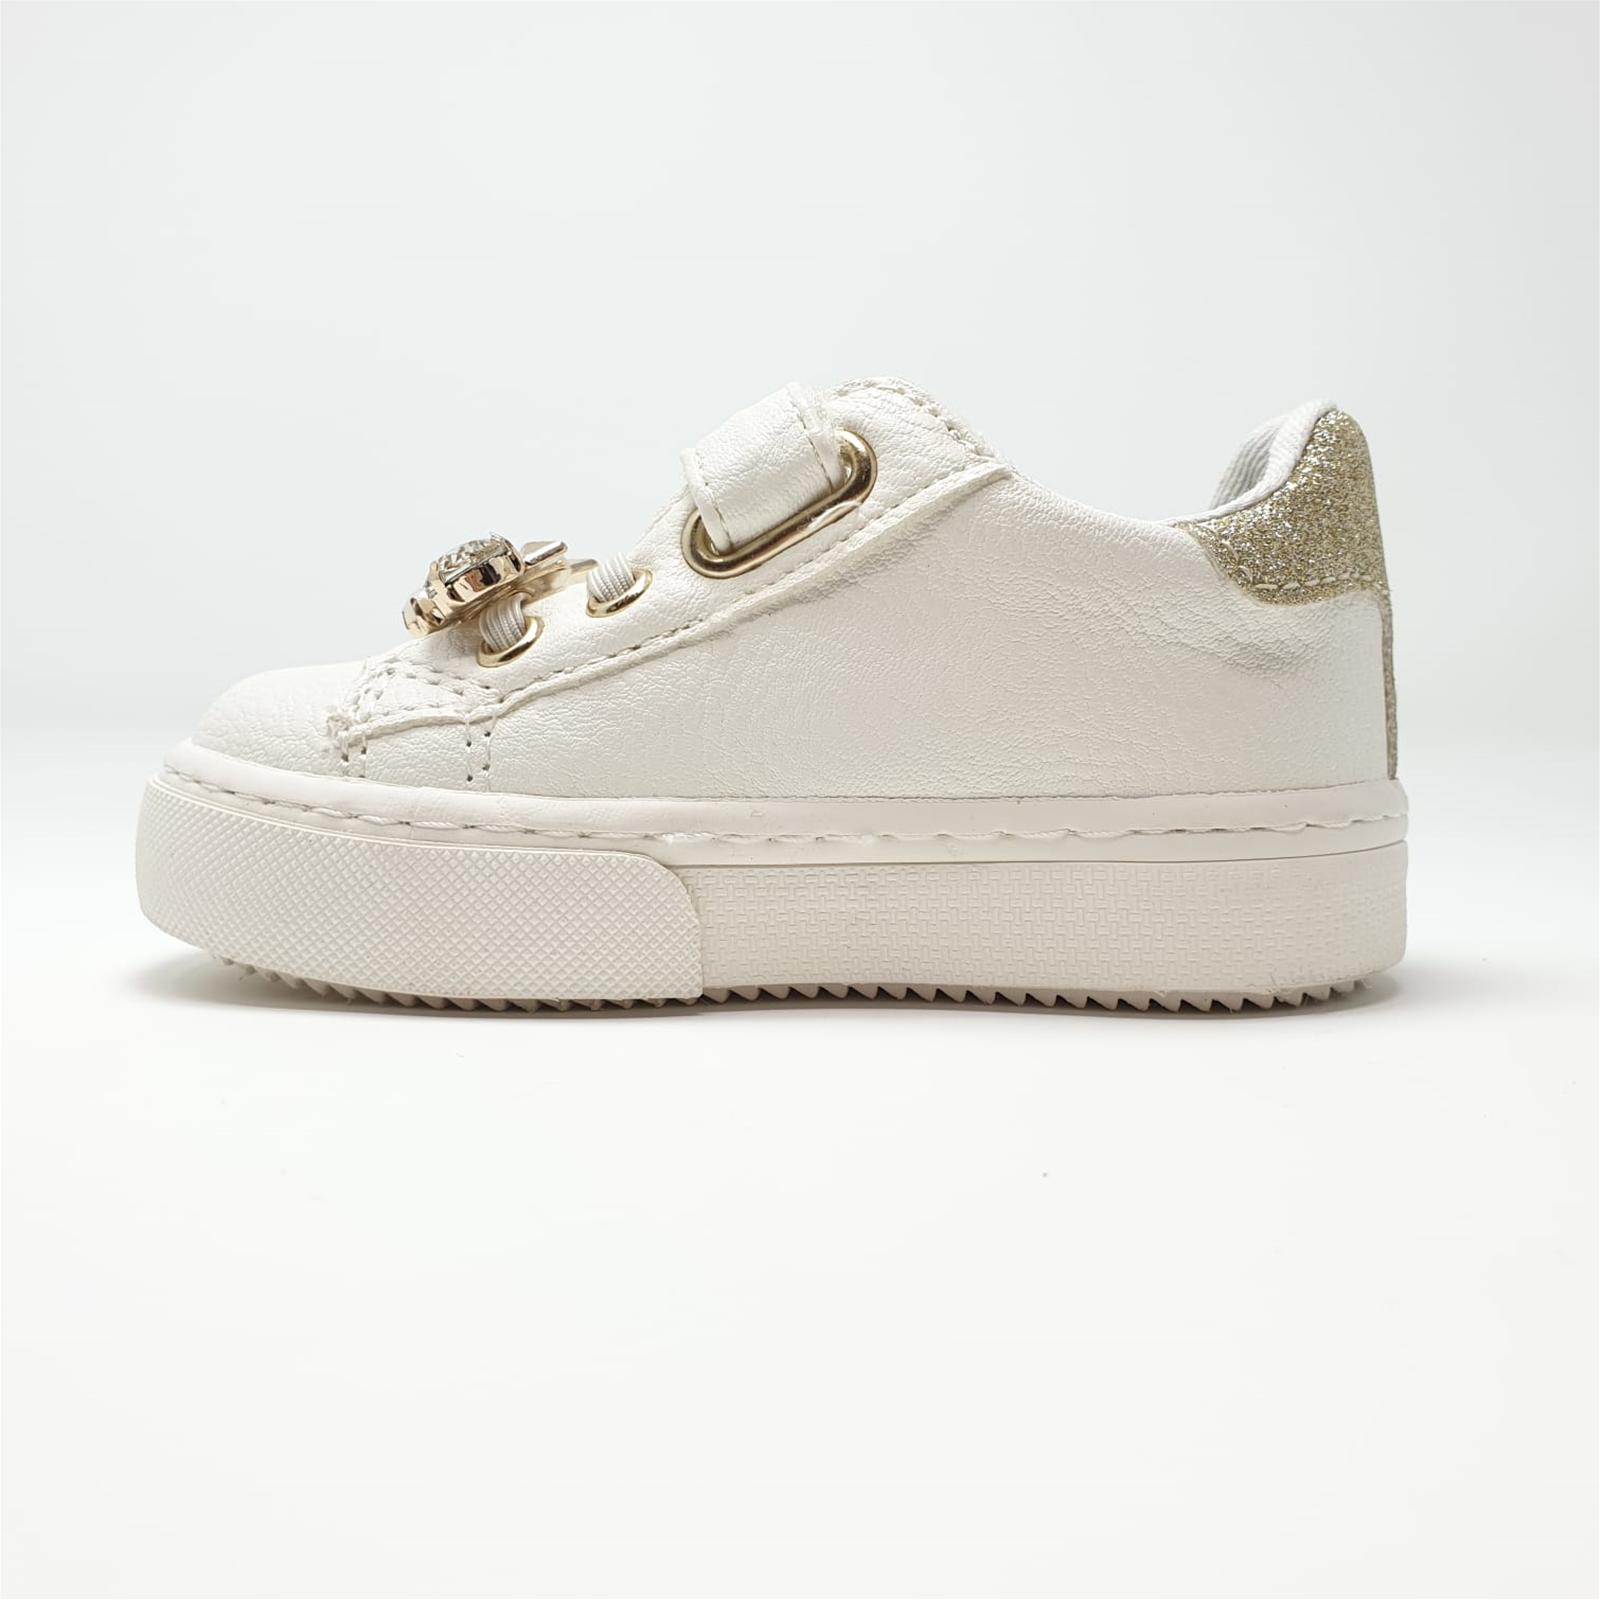 Dettagli su Scarpe sneaker Liu Jo bambina 20222 colore bianco latteplatino listino € 79,50